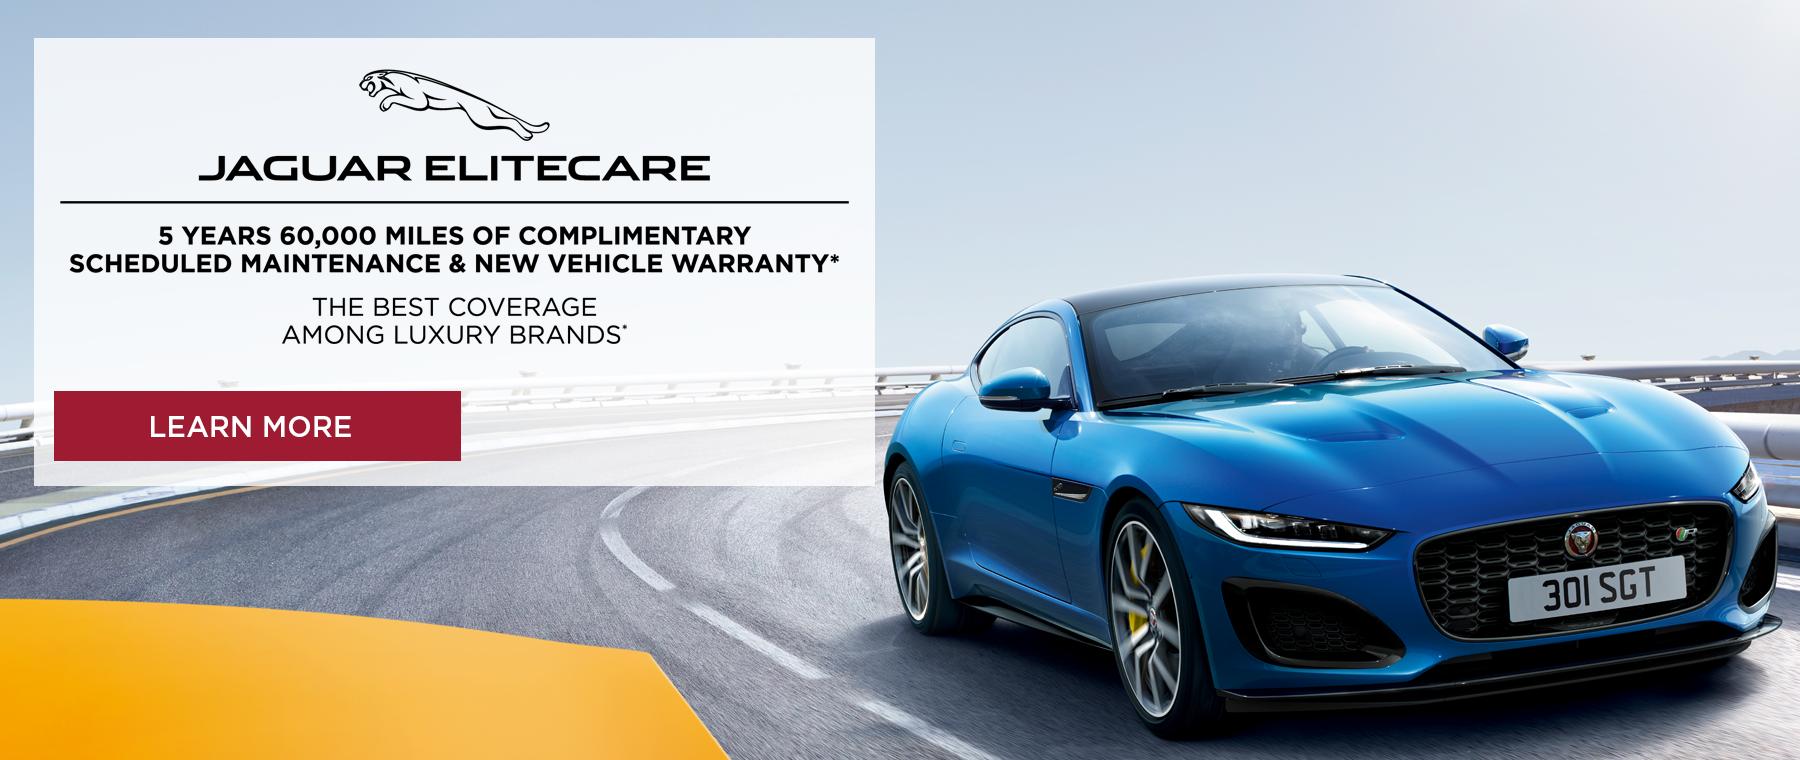 Jaguar Elitecare DI 1800×760 (1)